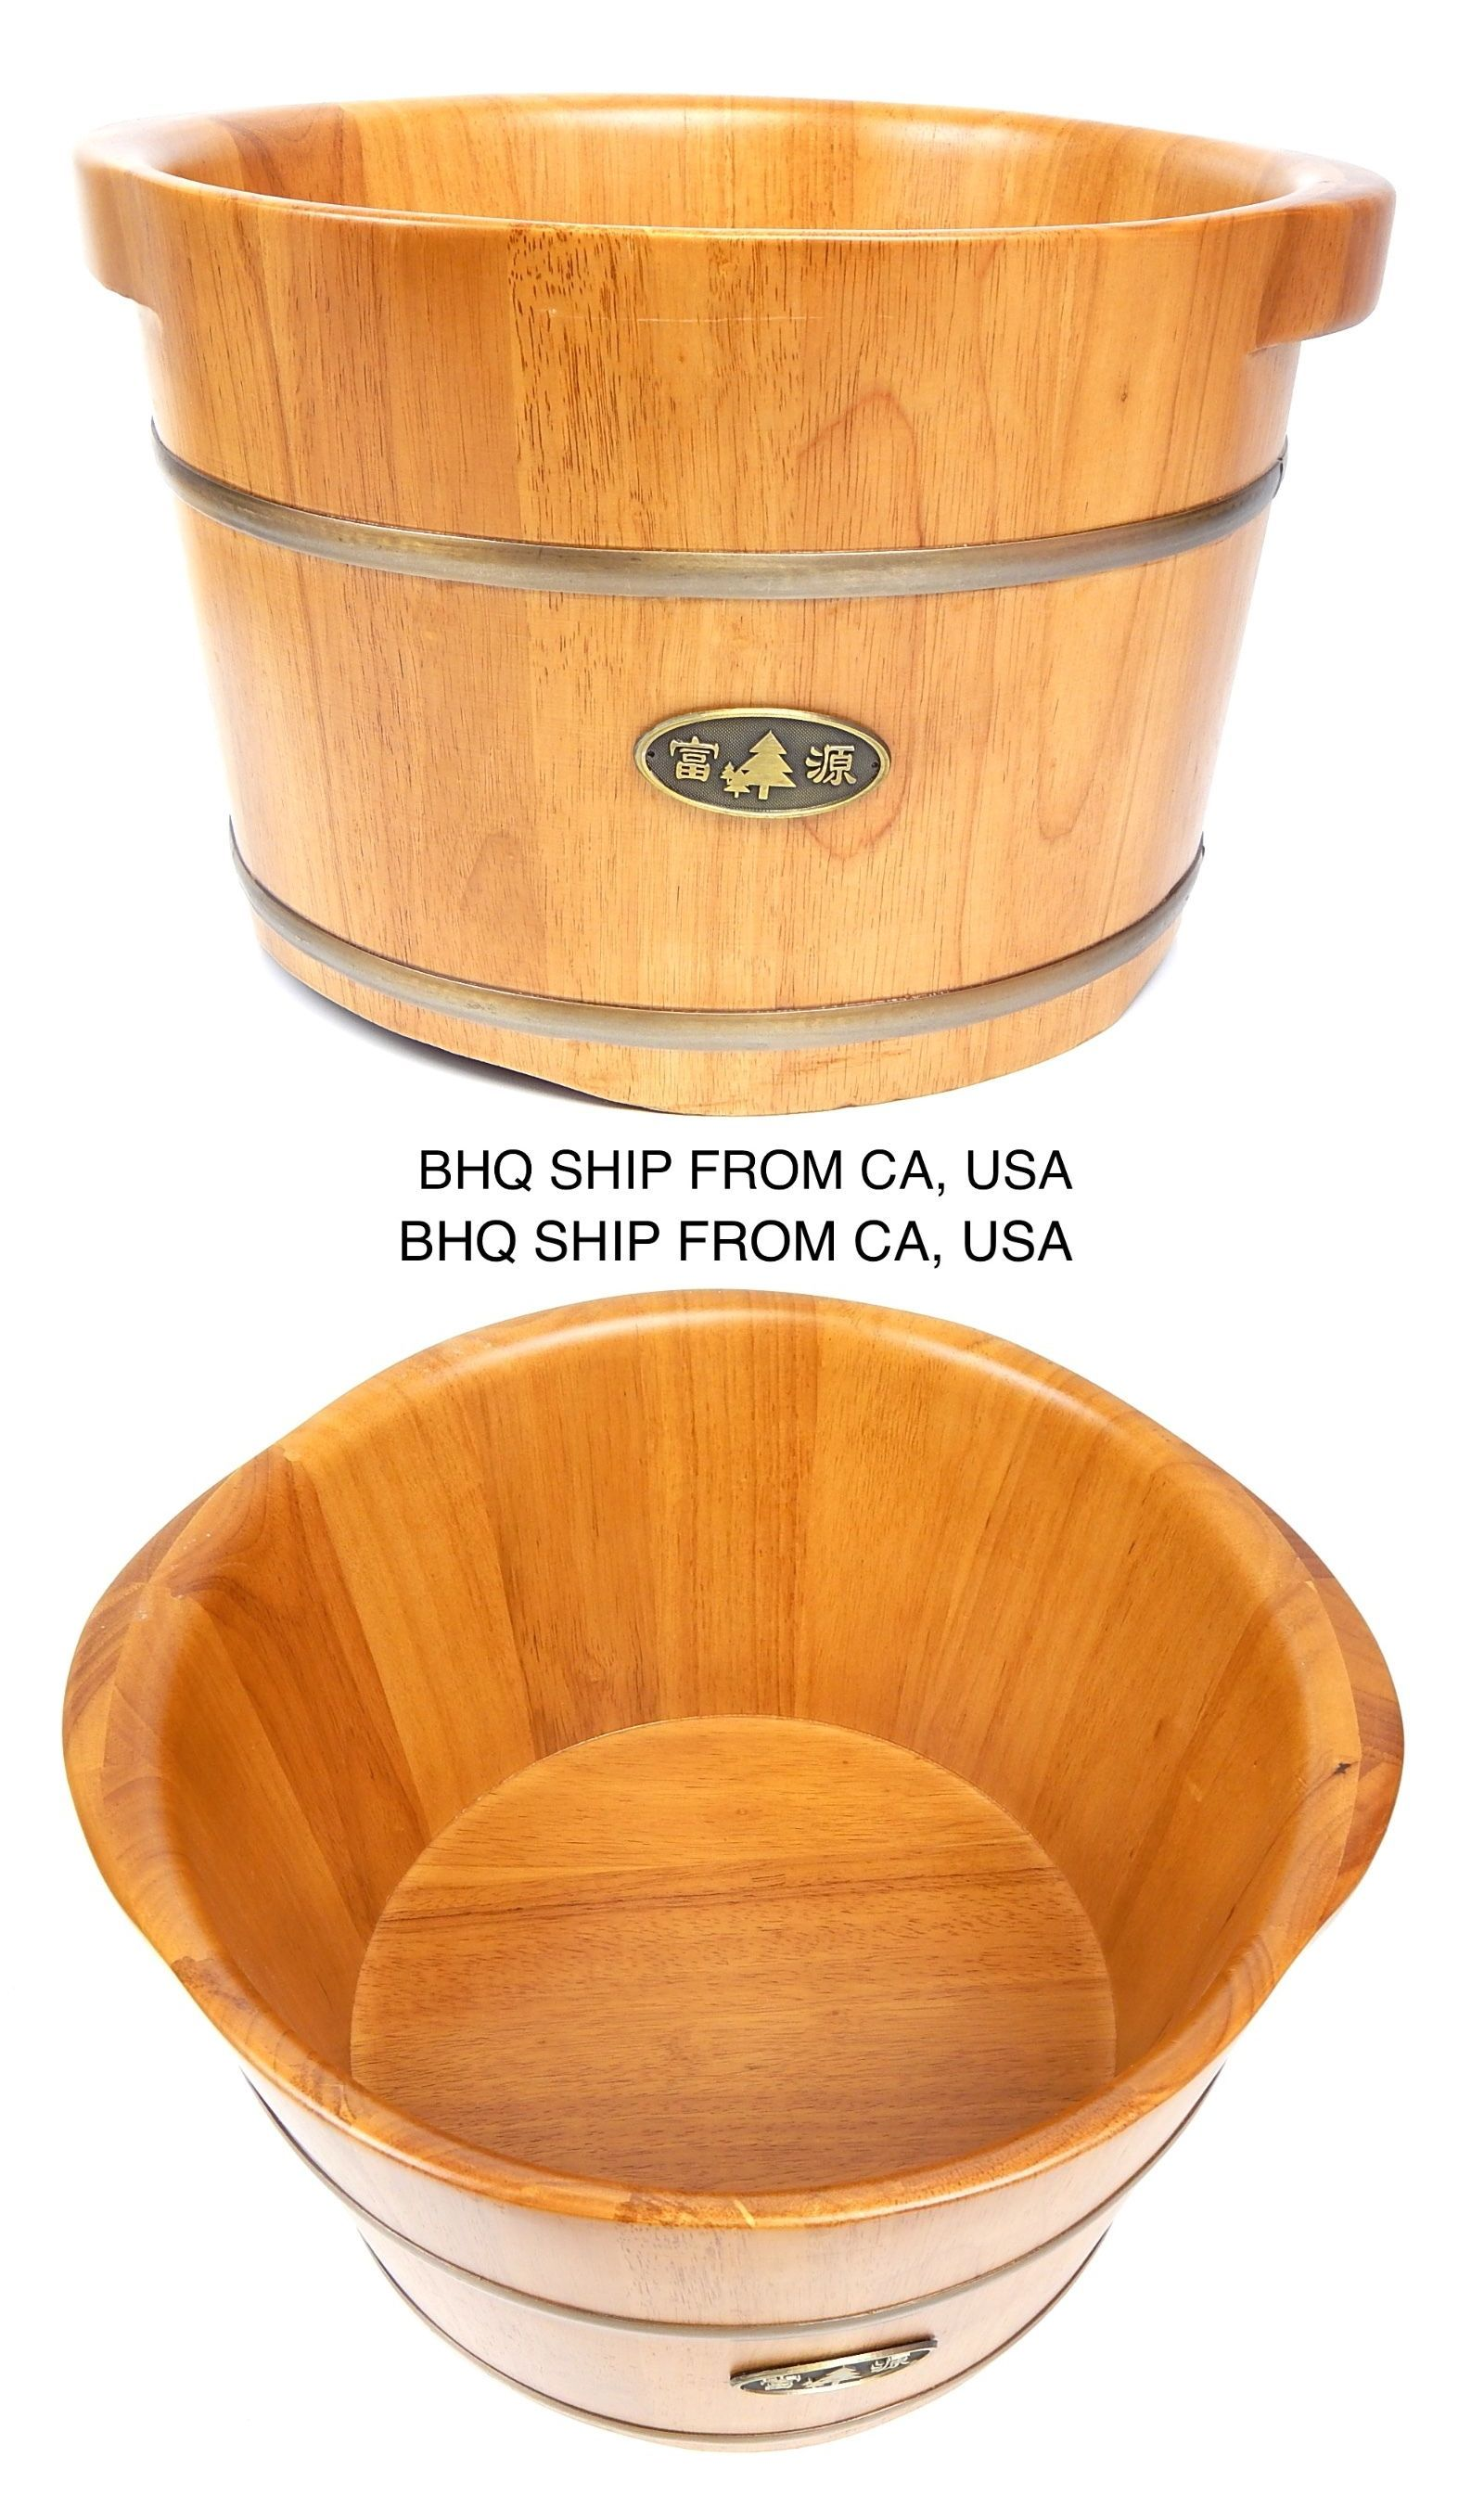 Spas Baths and Supplies: Round Wooden Foot Soaking Tub + 50 Pcs ...